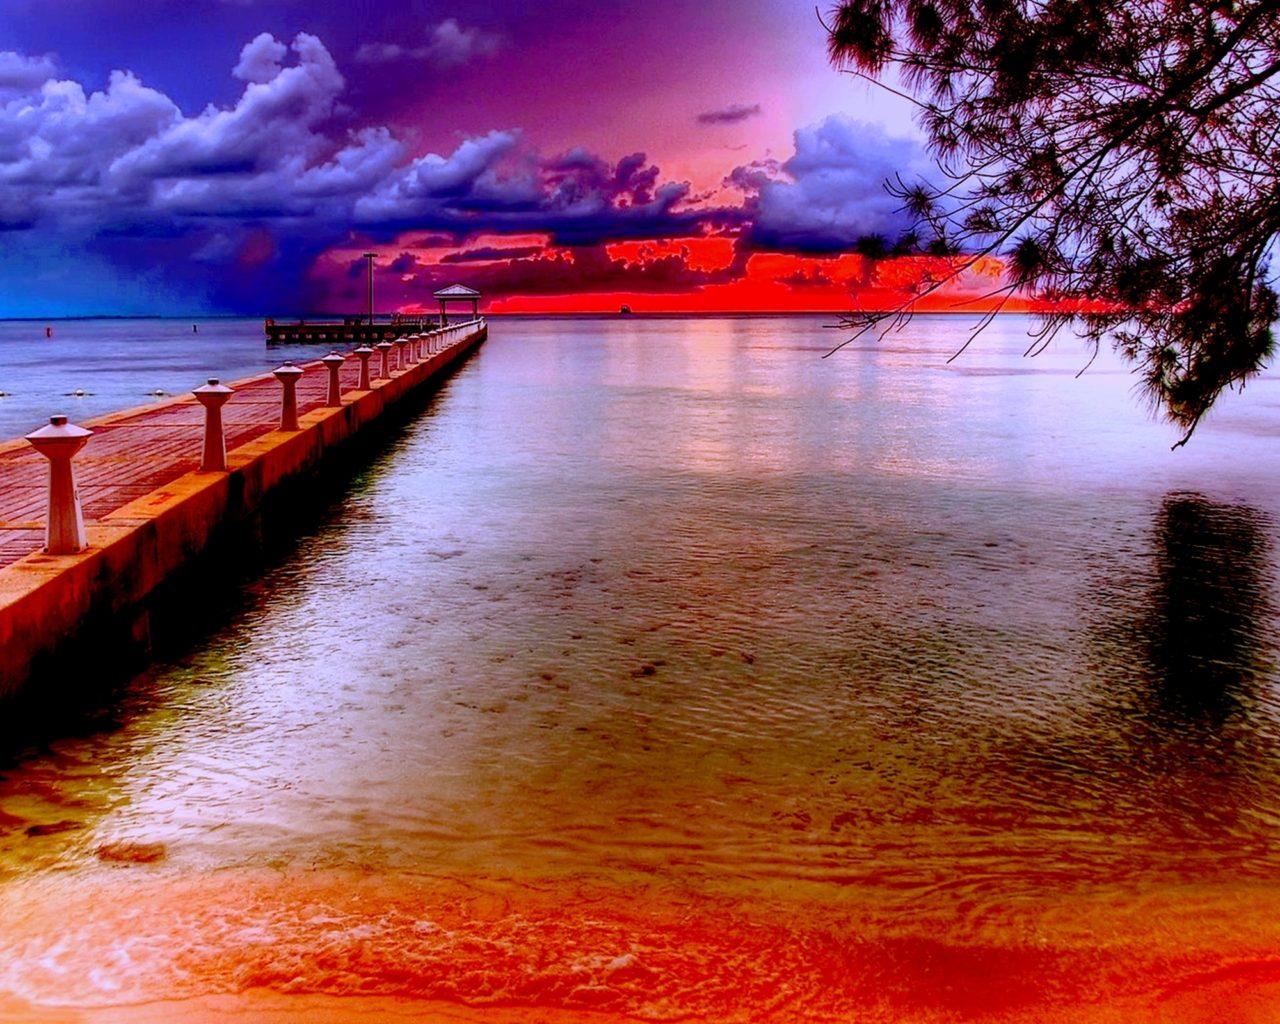 Hd Wallpaper Girl Christmas Sunset Beautiful Horizon Wallpaper 244230 Wallpapers13 Com